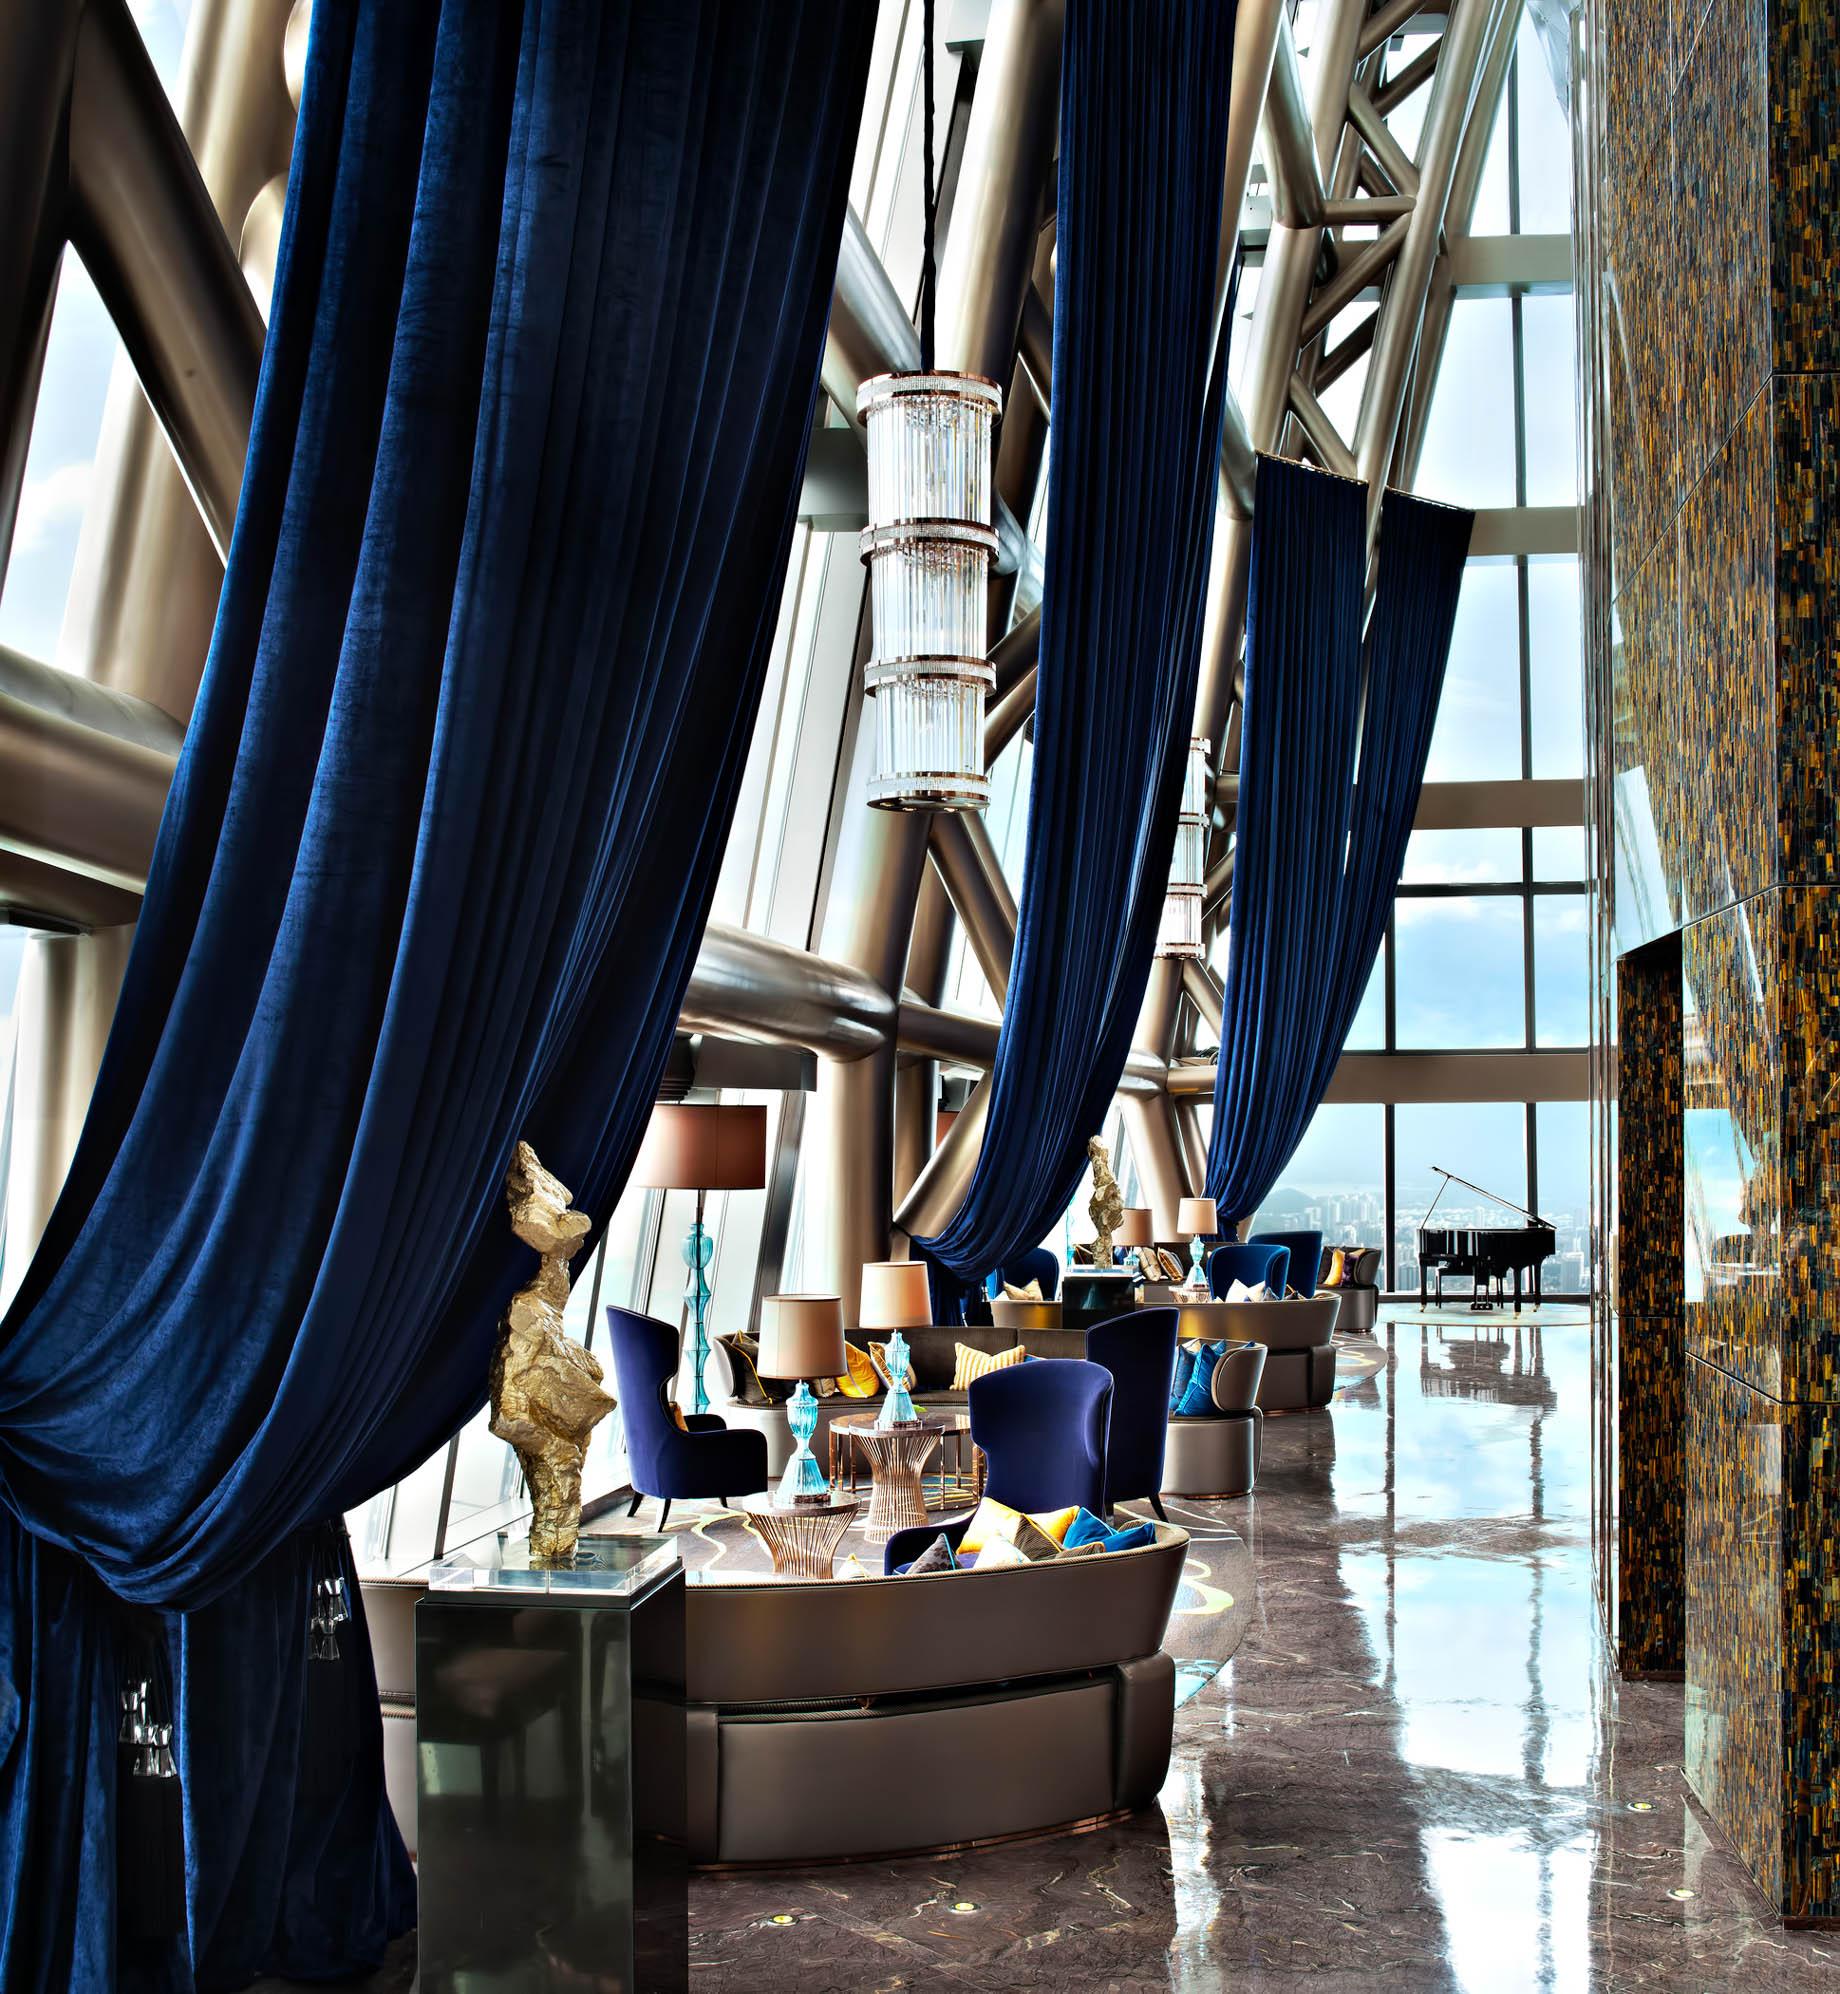 The St. Regis Shenzhen Luxury Hotel - Shenzhen, China - The Drawing Room